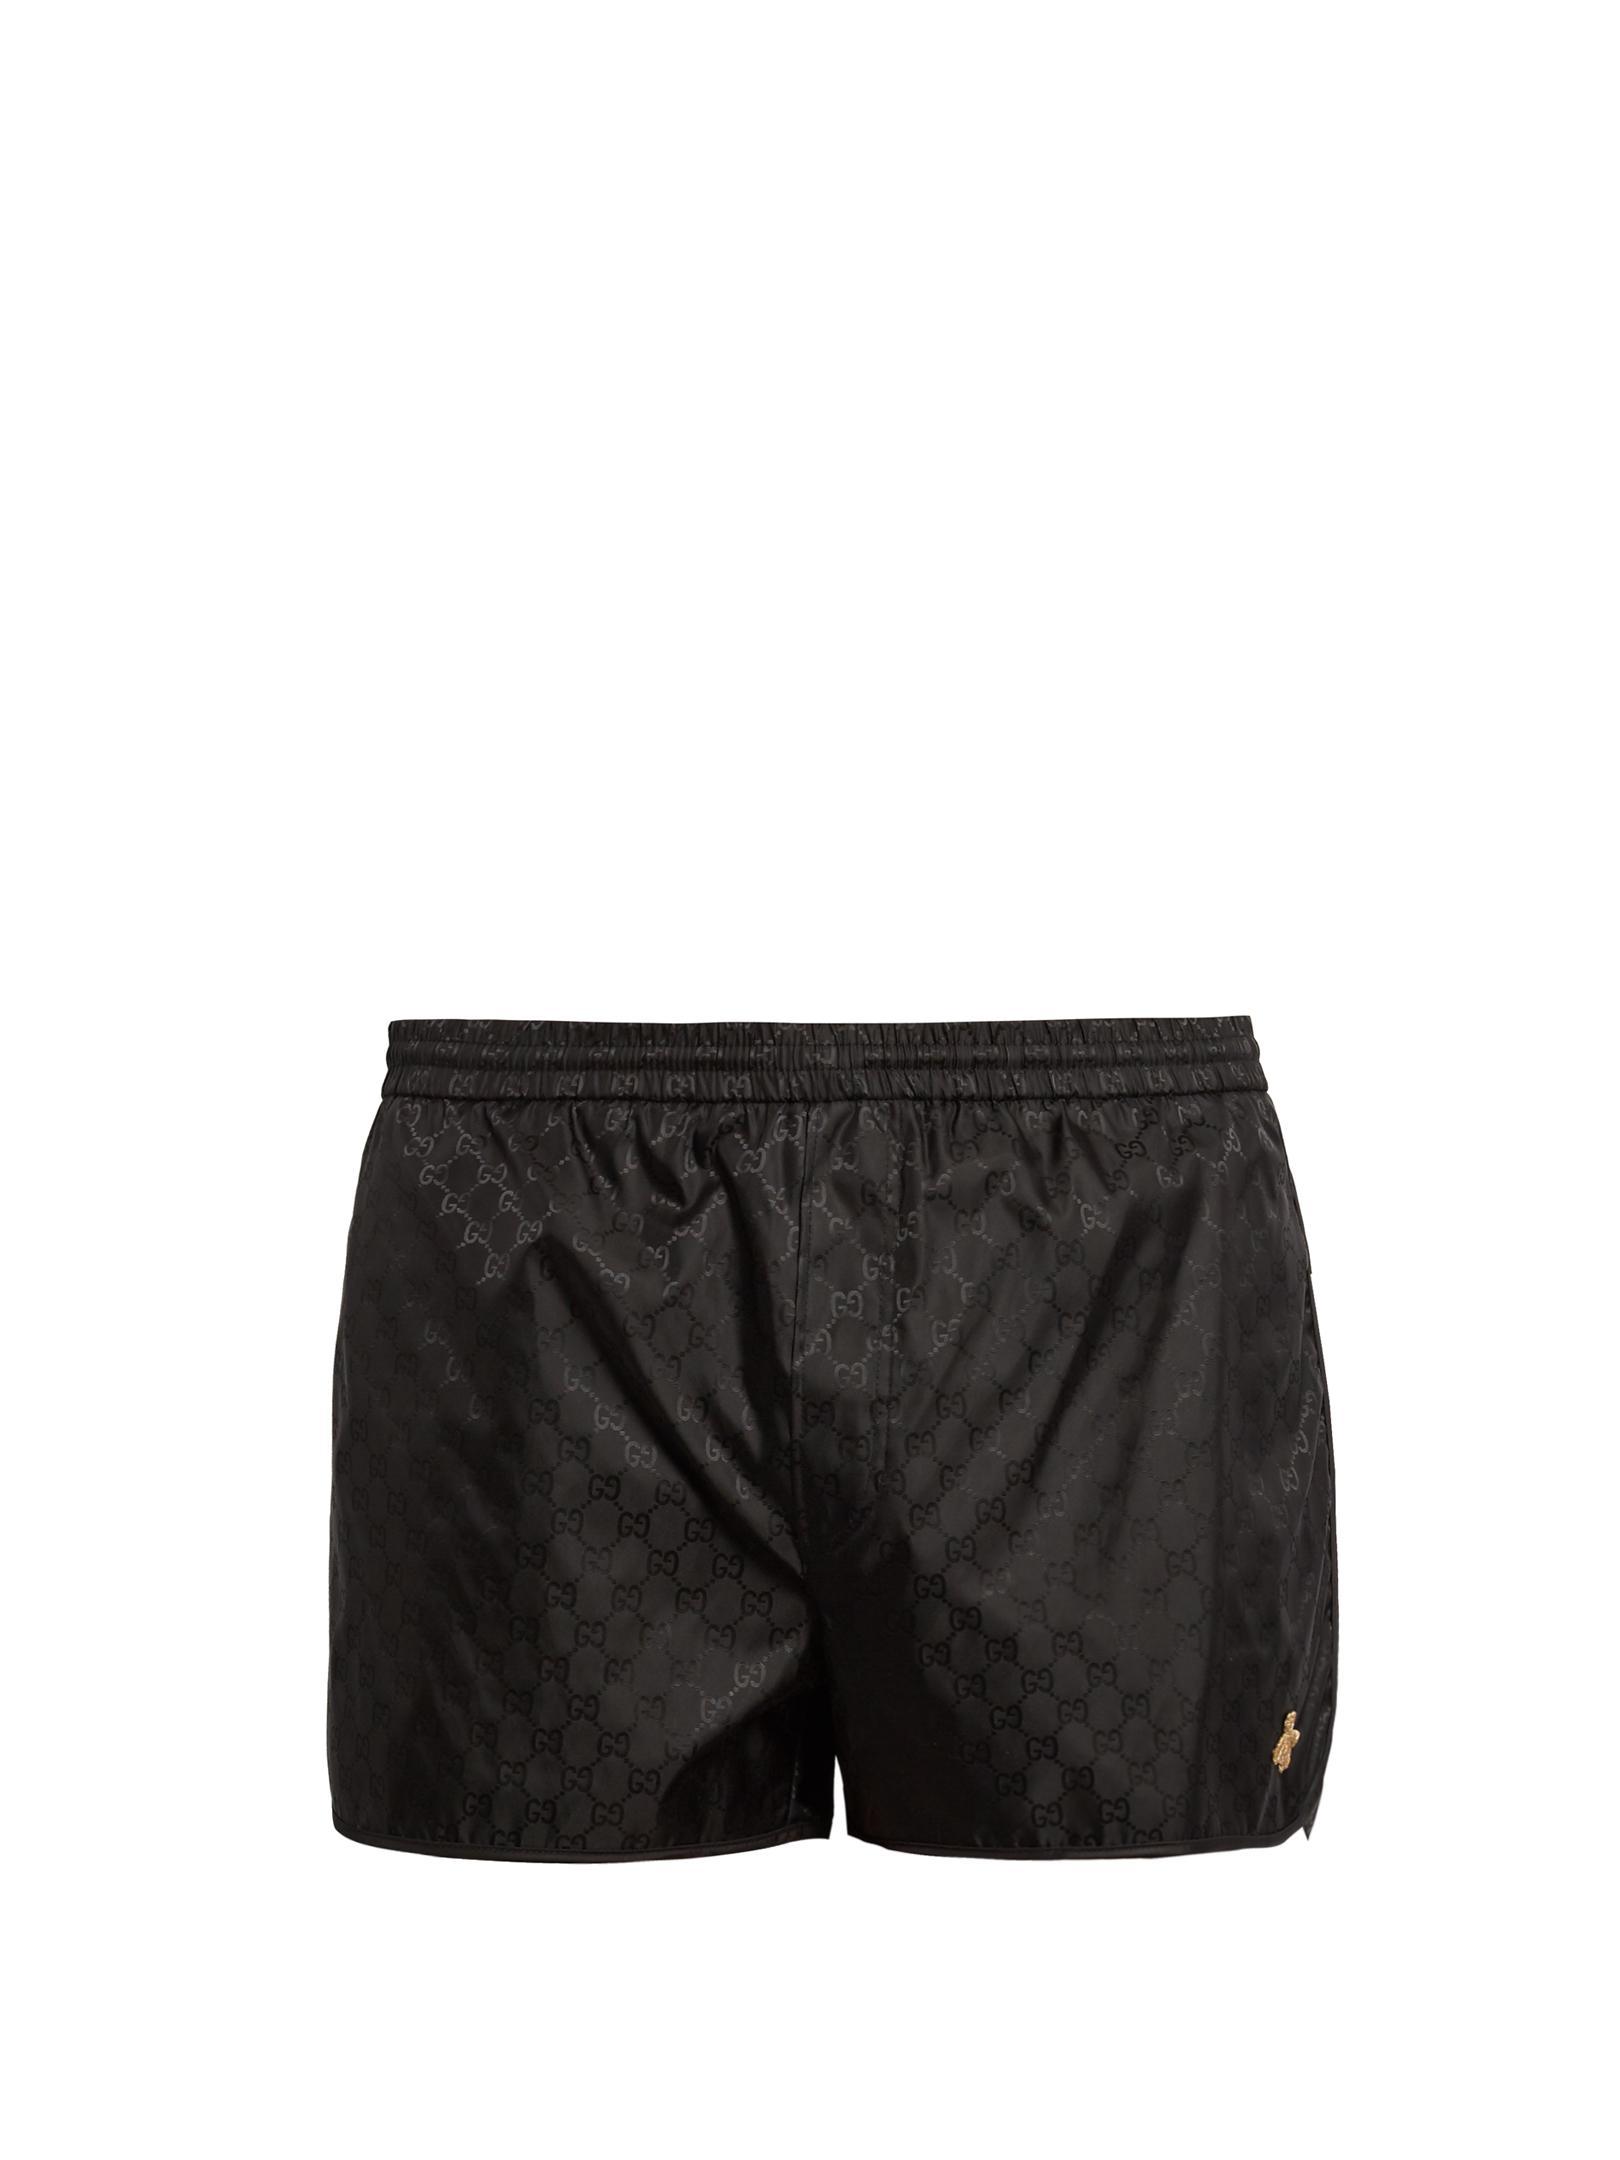 fe6cb05ef6 Gucci Gg Nylon Swim Shorts in Black for Men - Lyst